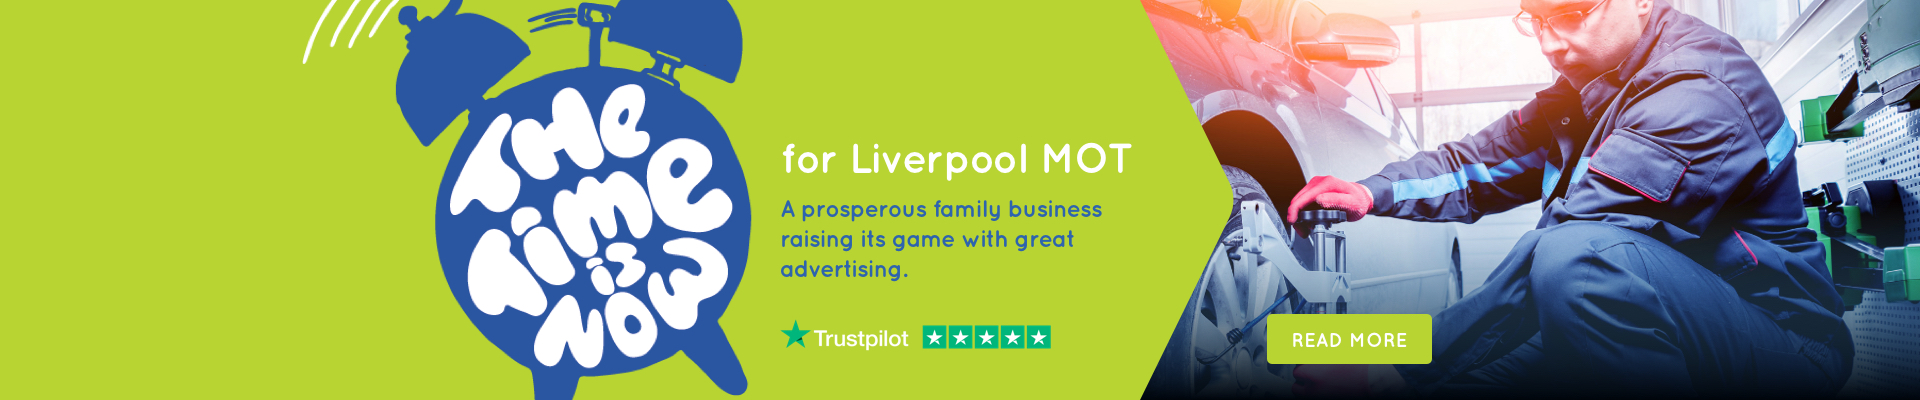 Liverpool MOT